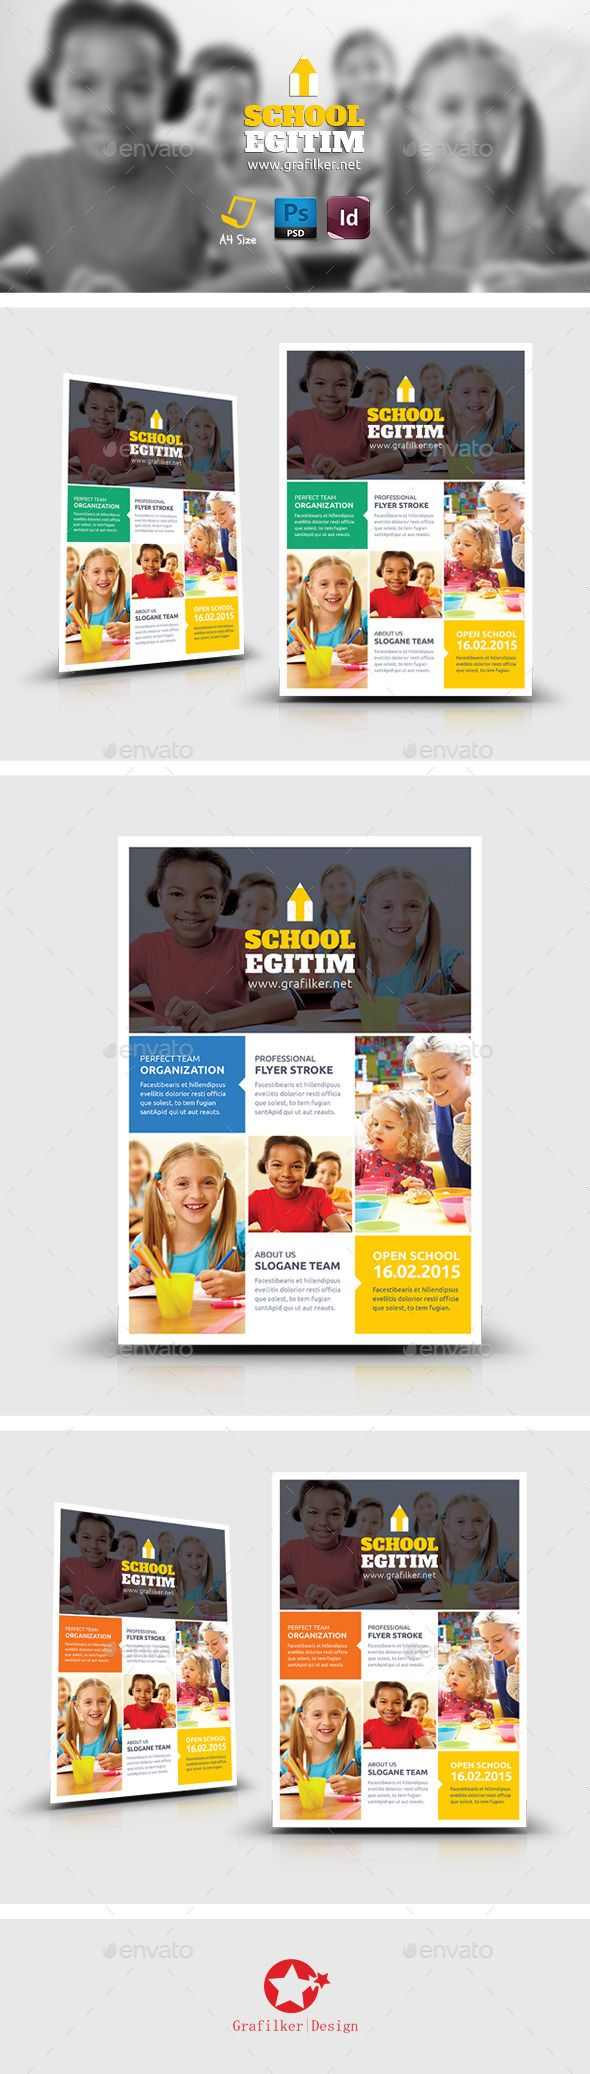 Kids School Flyer Template PSD | Buy and Download: http://graphicriver.net/item/kids-school-flyer-templates/8861162?WT.ac=category_thumb&WT.z_author=grafilker02&ref=ksioks